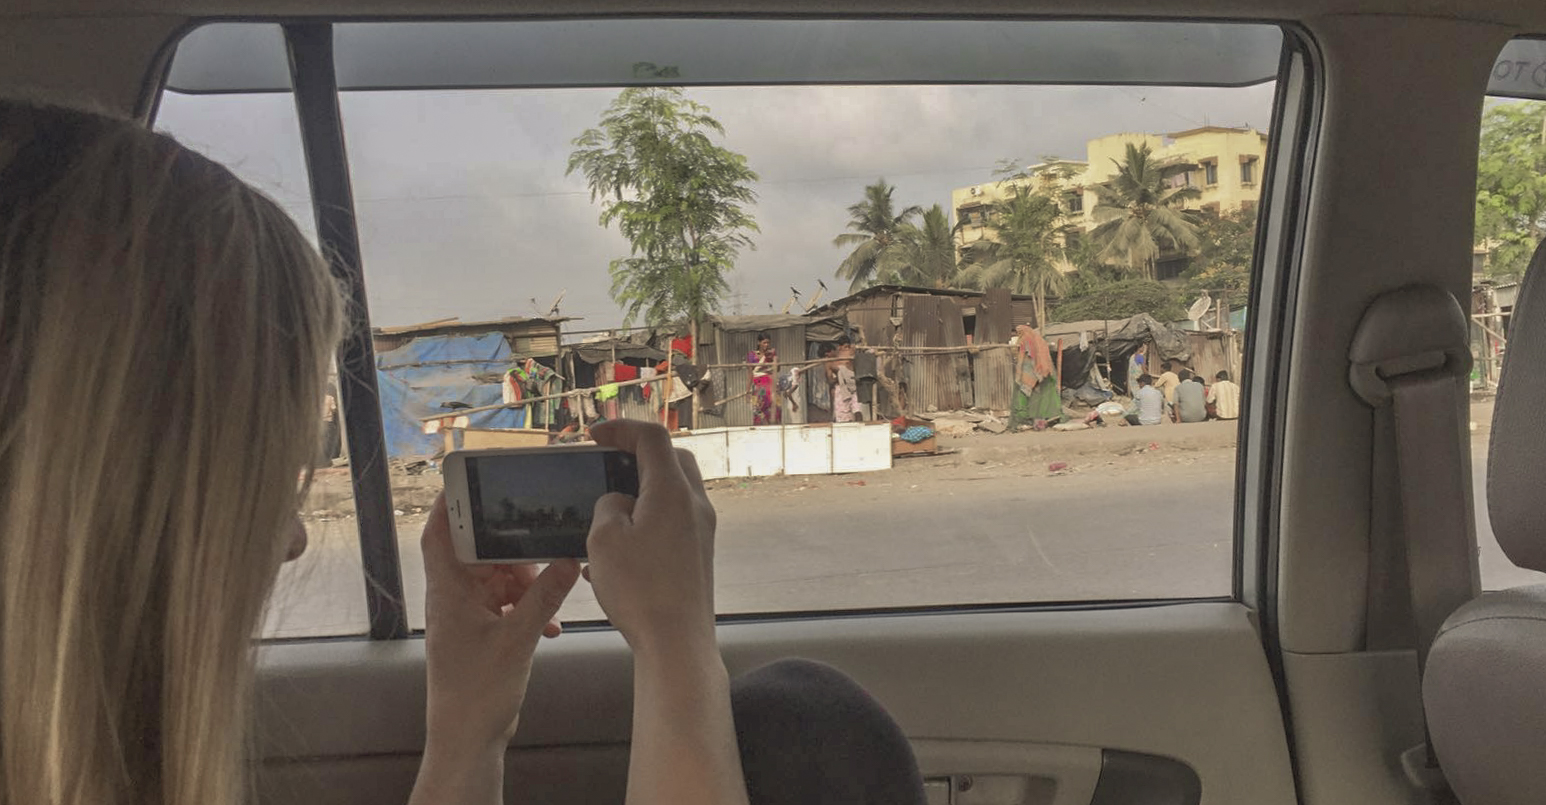 Cab ride through a residential area 3/4